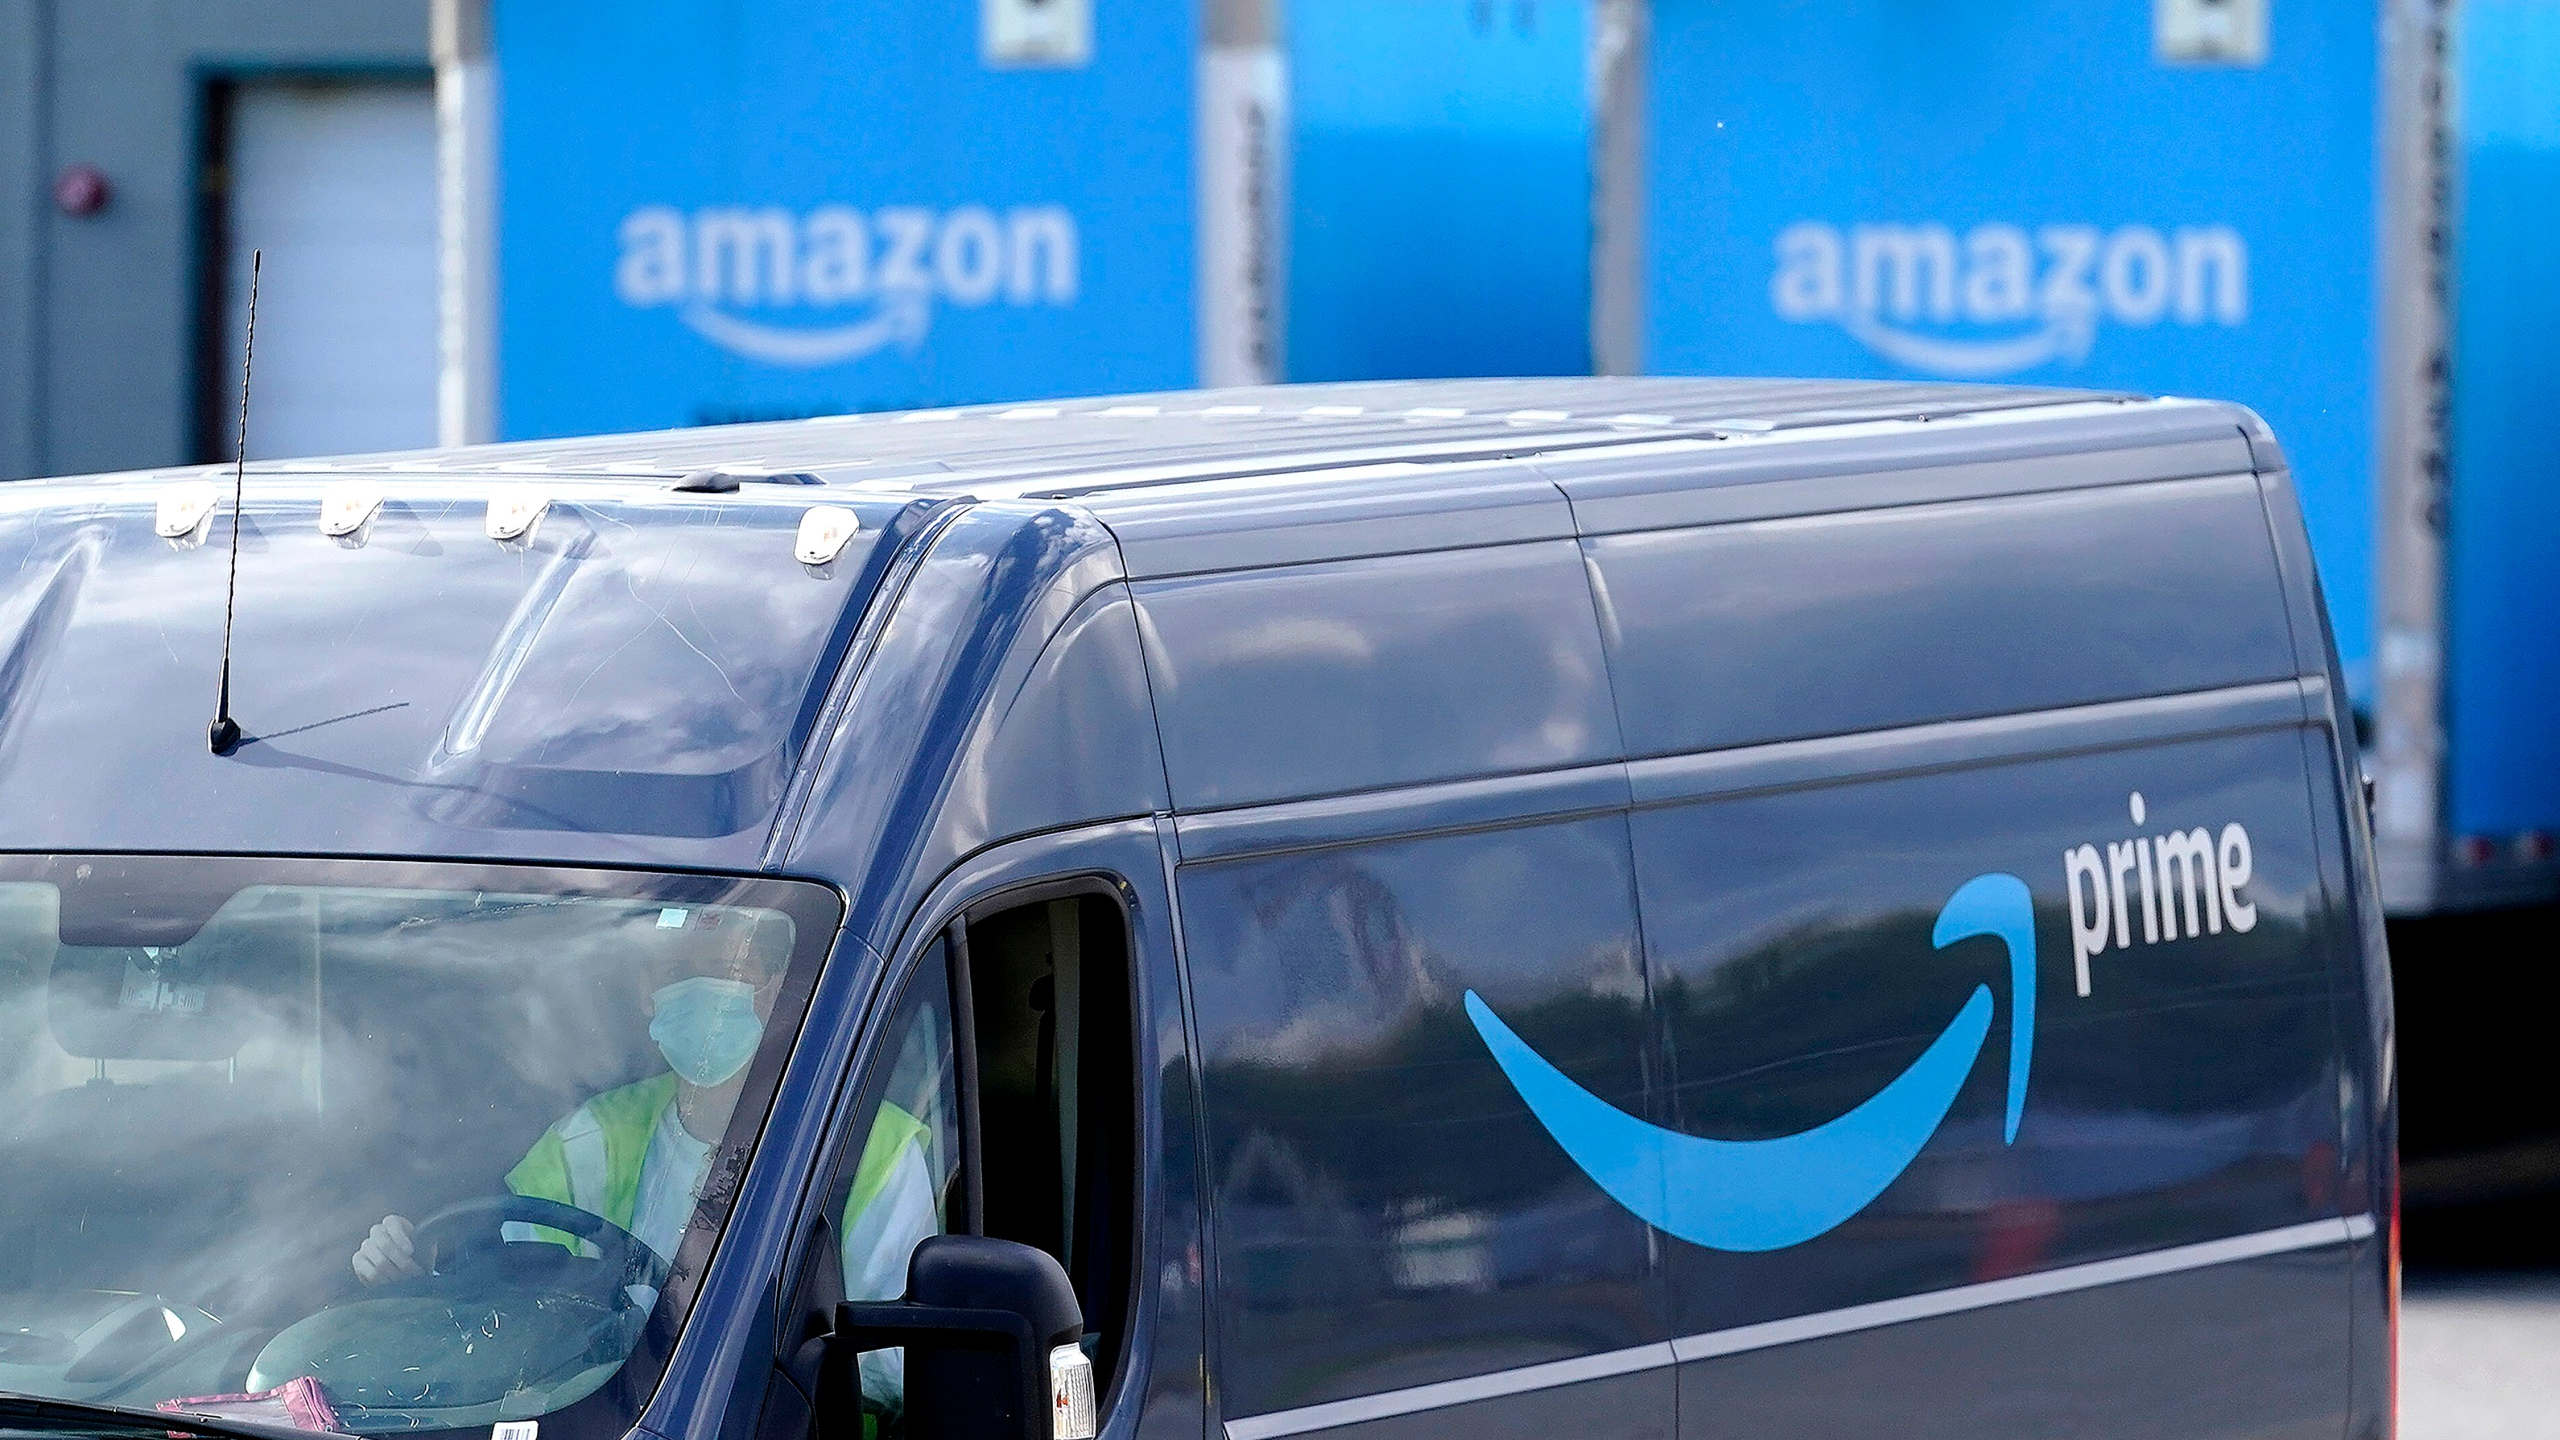 An Amazon Prime delivery van